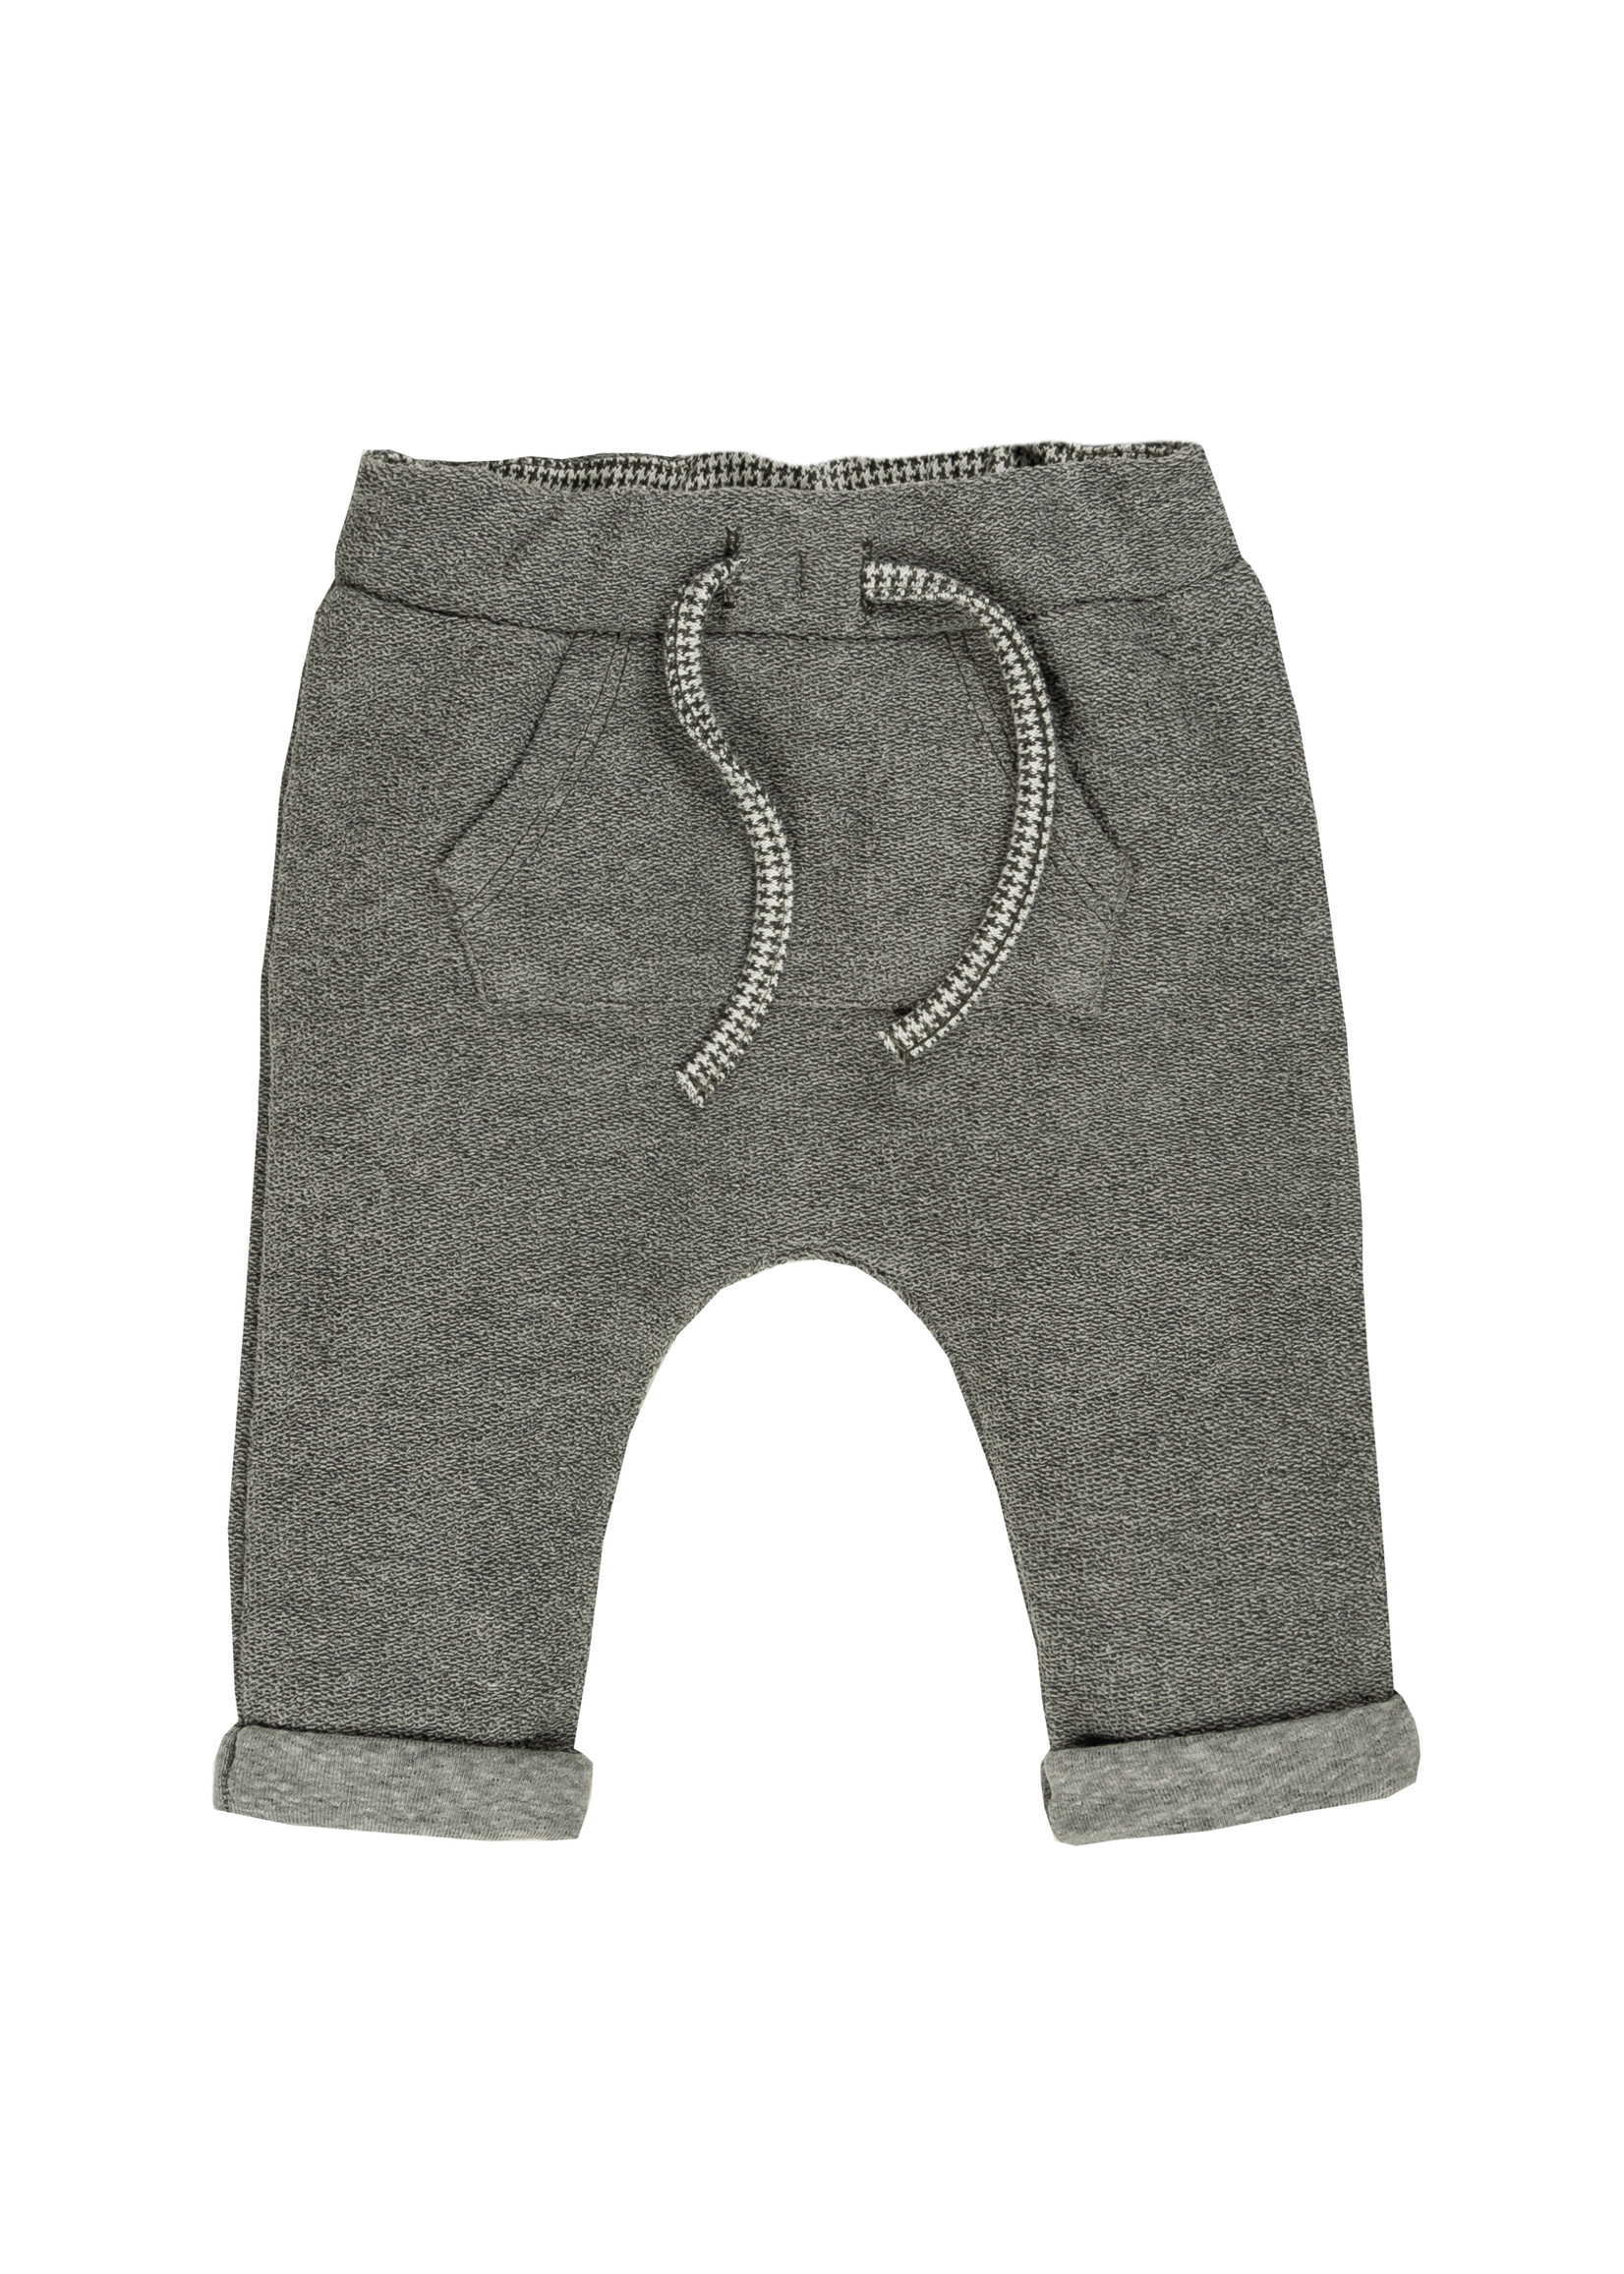 EMC EMC fleece trousers grey